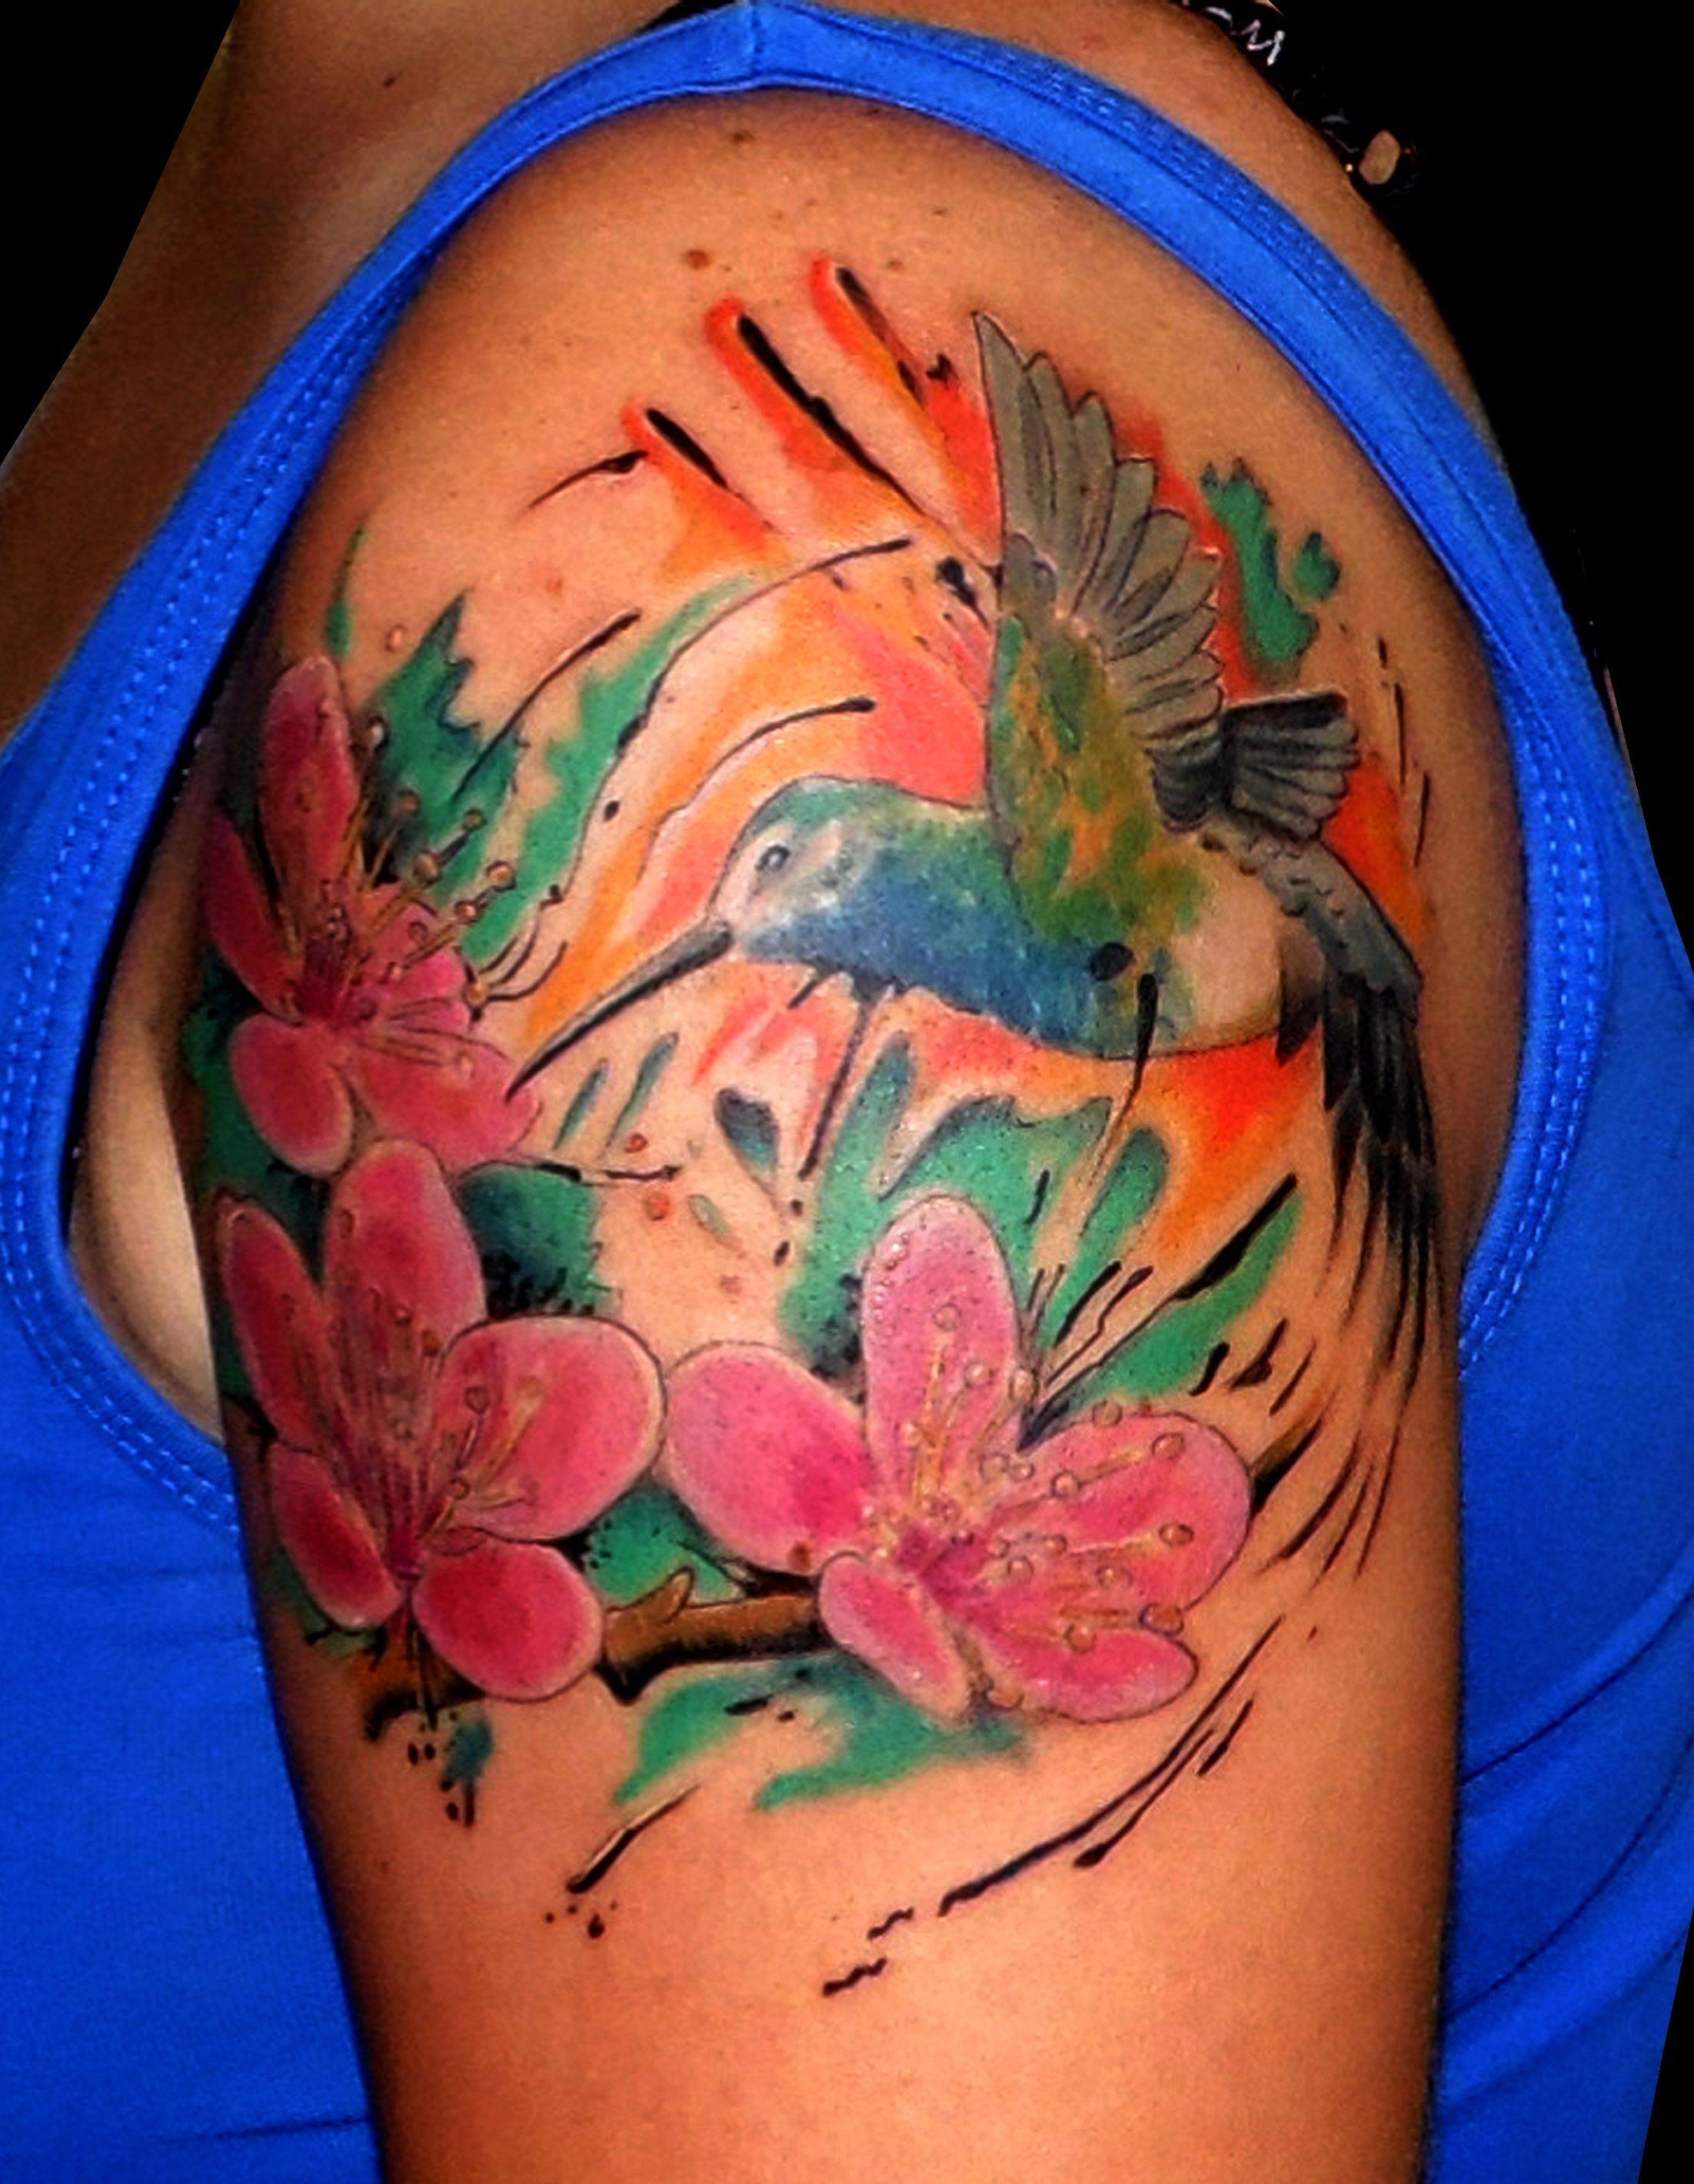 Tatuaje Tattoo Imágenes Color Colibrí Acuarela Hombro Brazo Flores